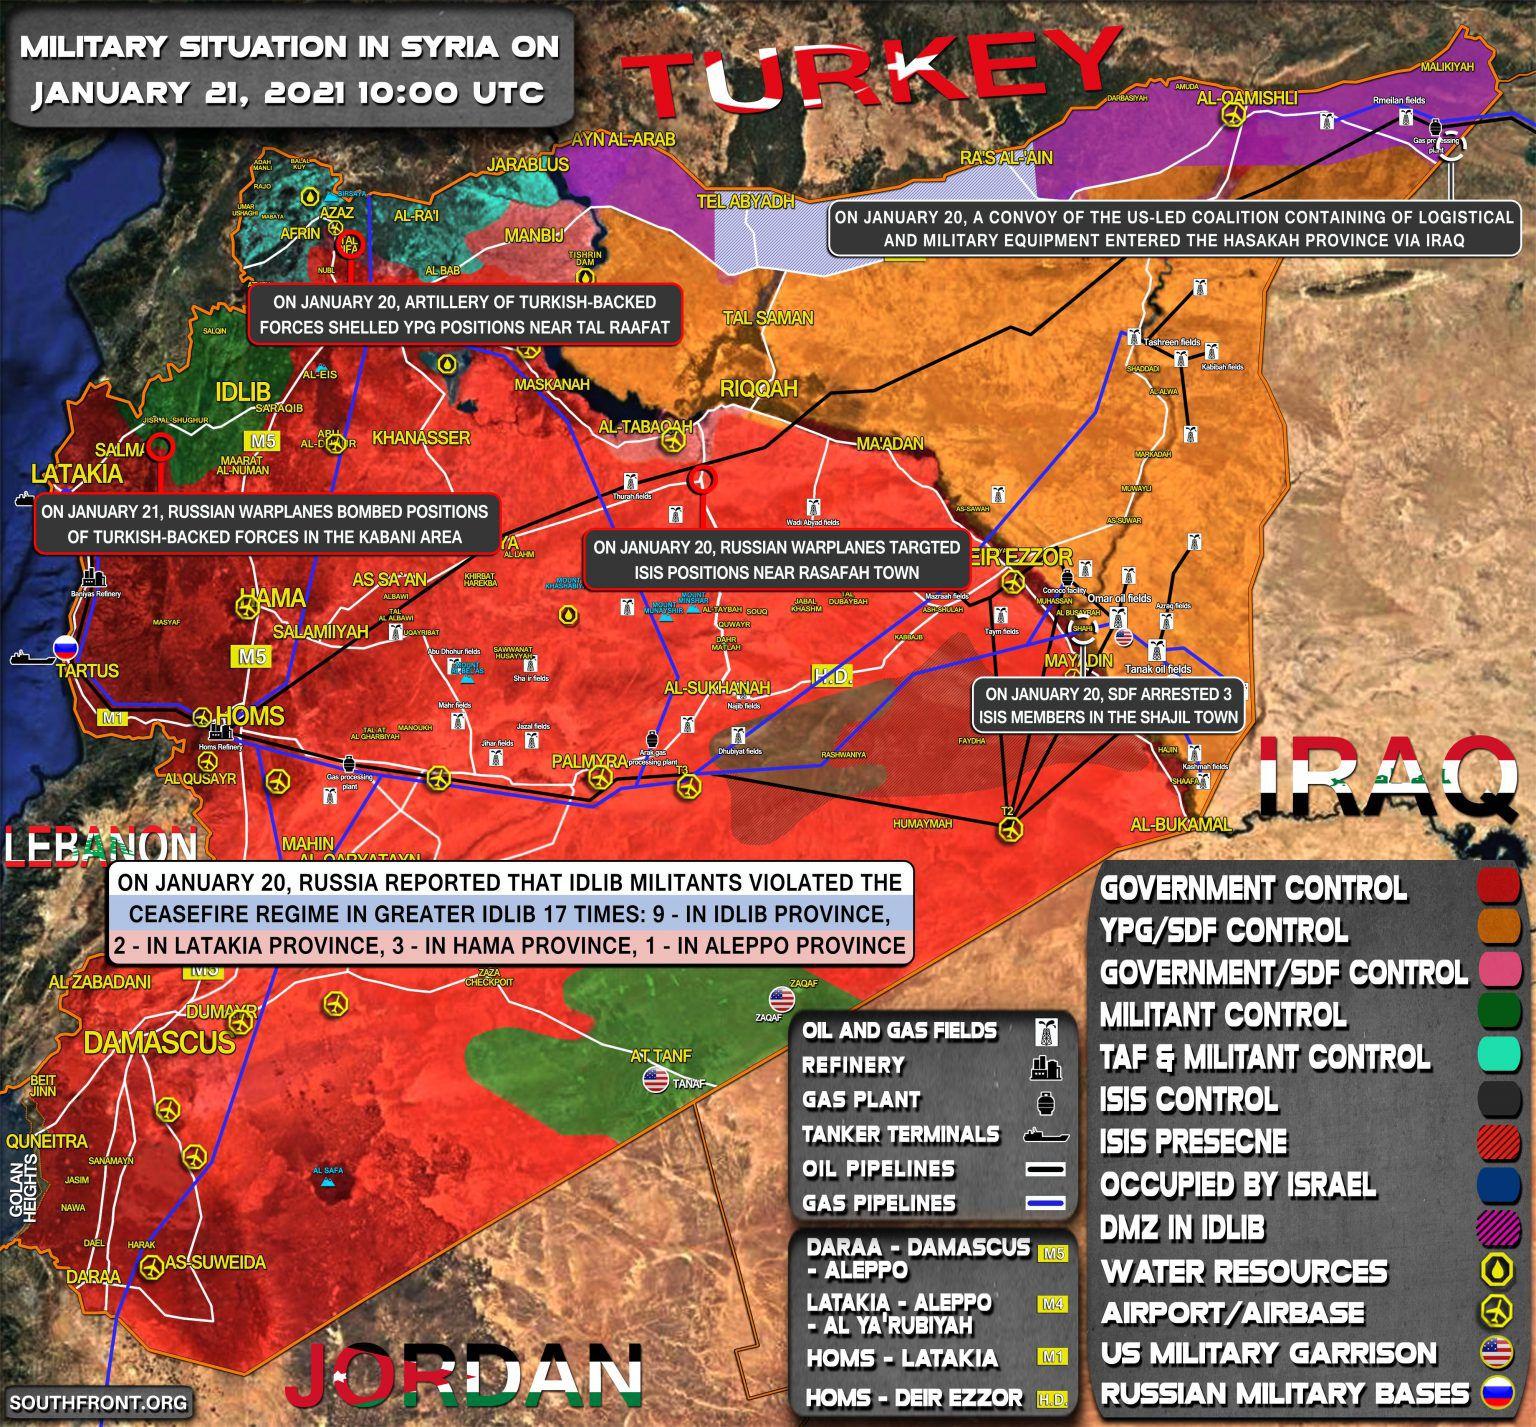 image_0780719_20210121_ob_97b557_21-01-21-syria